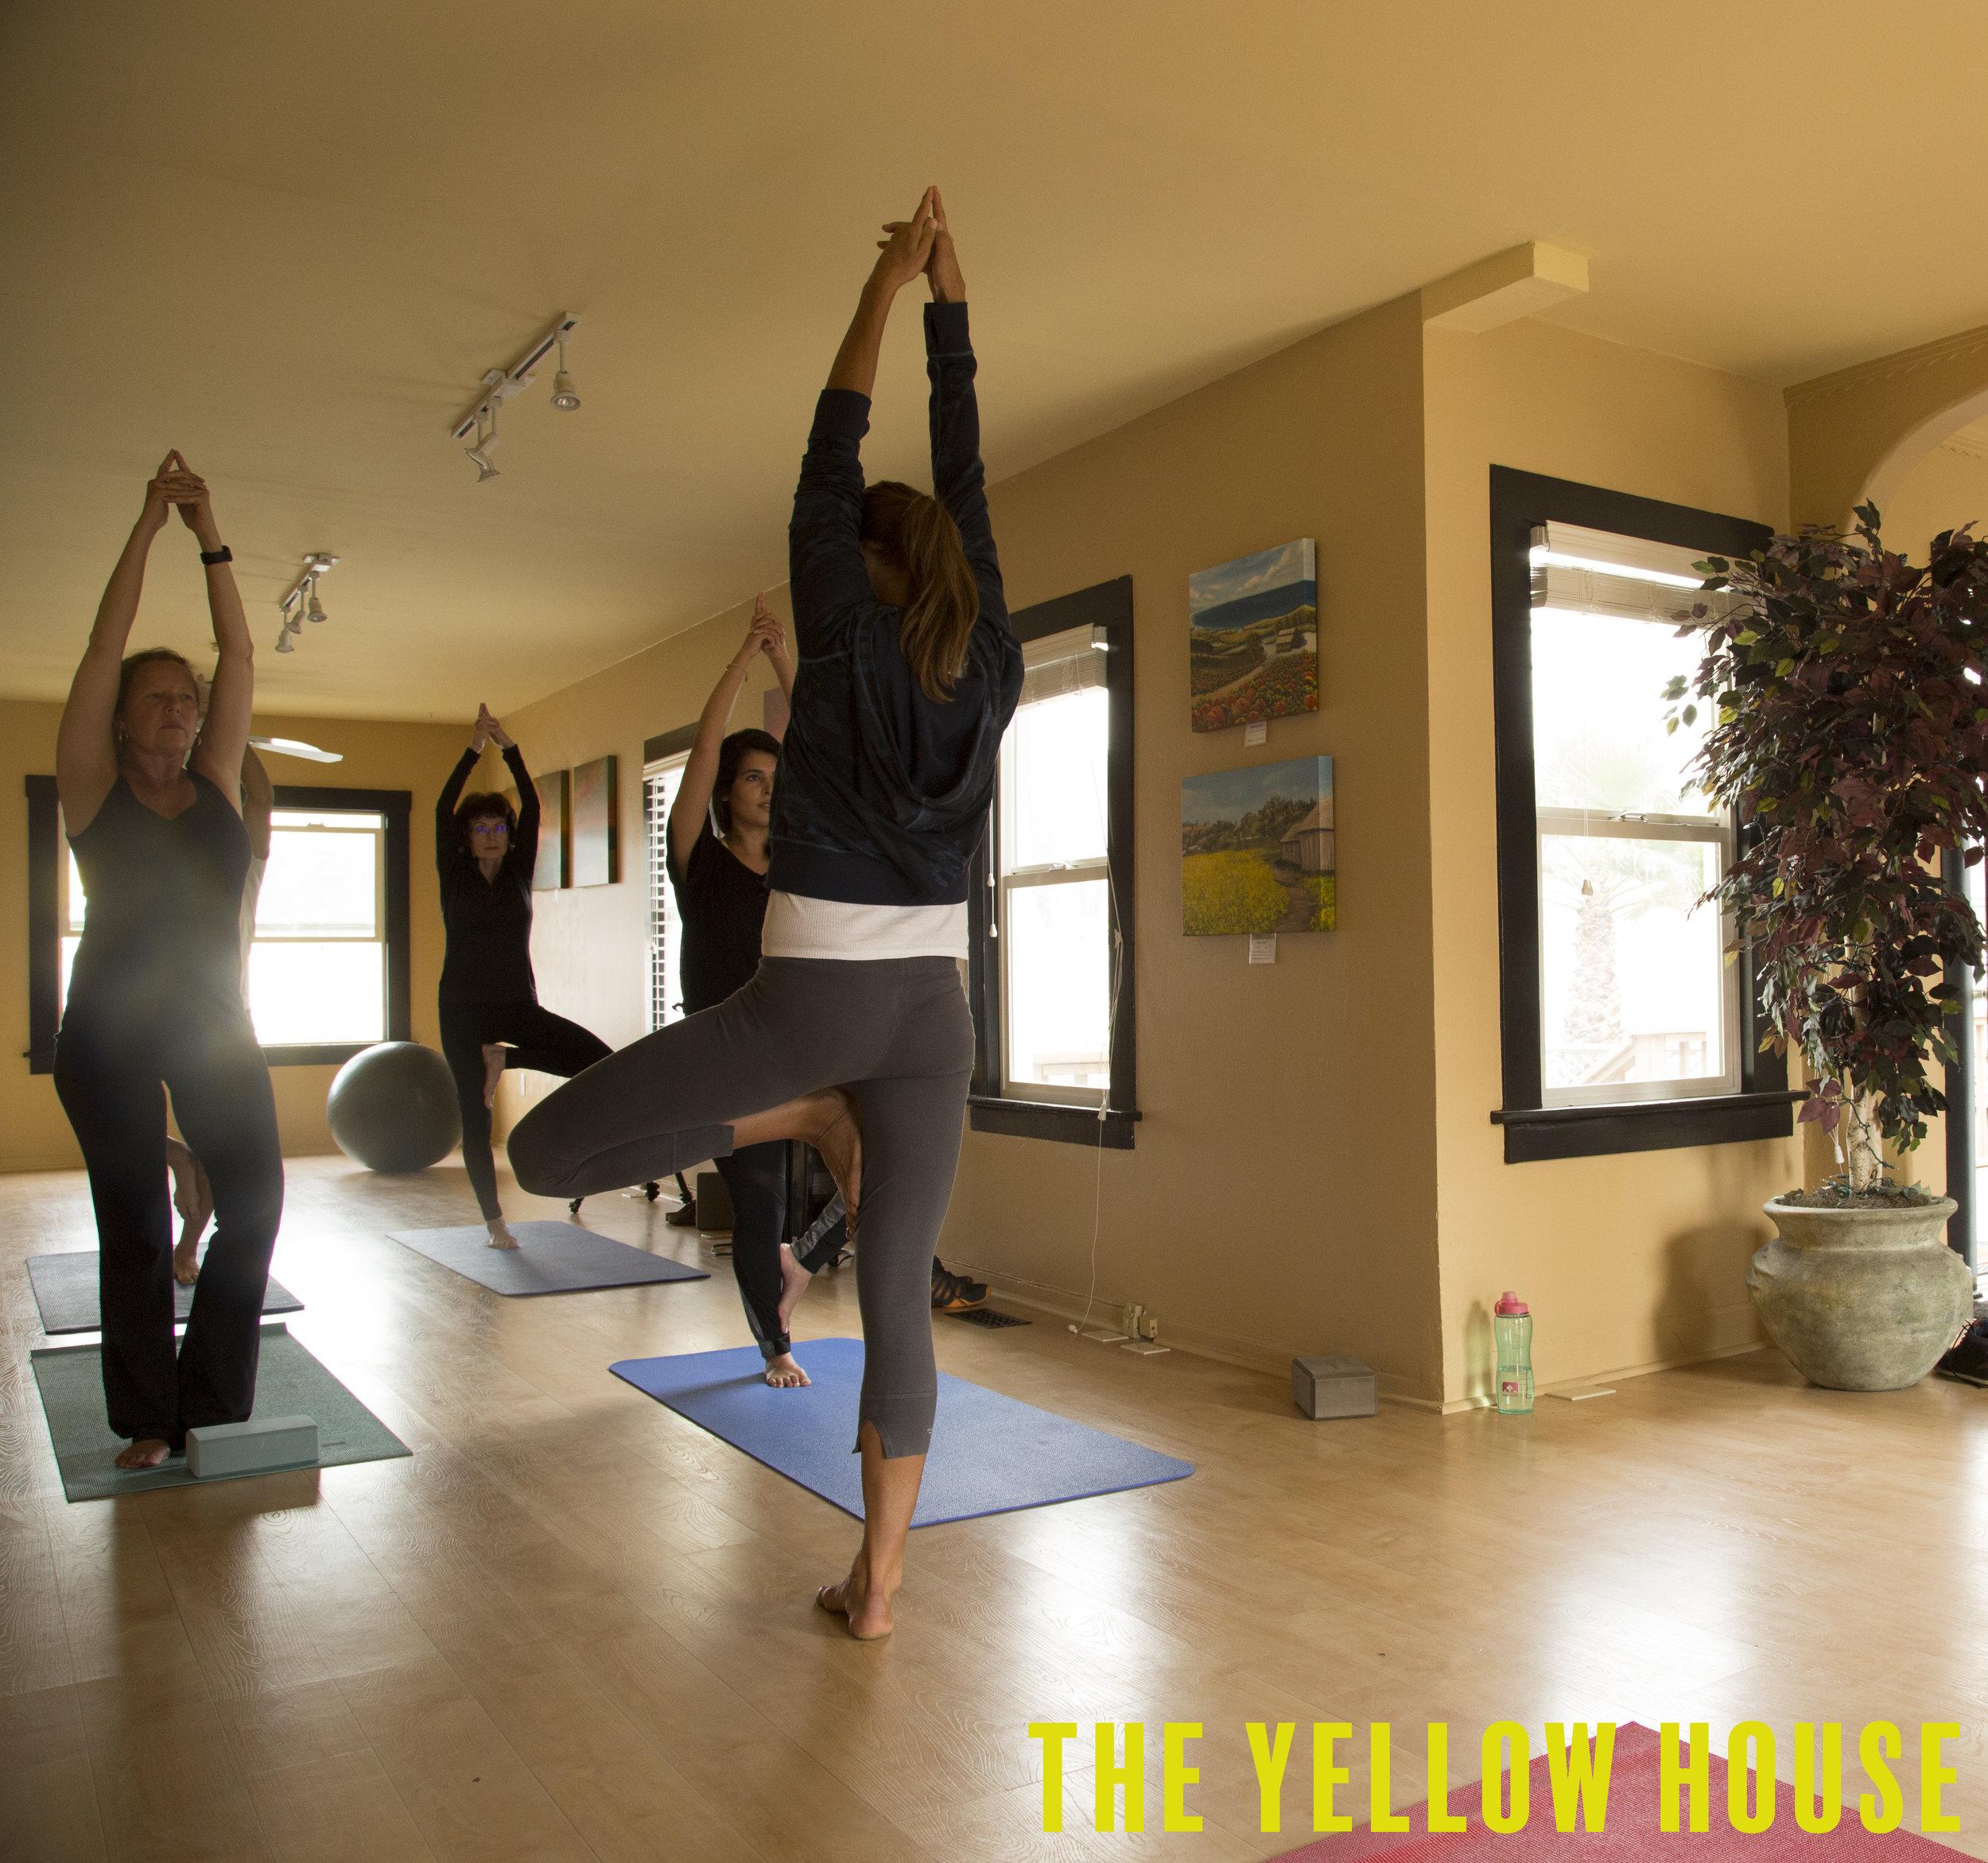 The_yellow_house_yoga.jpg